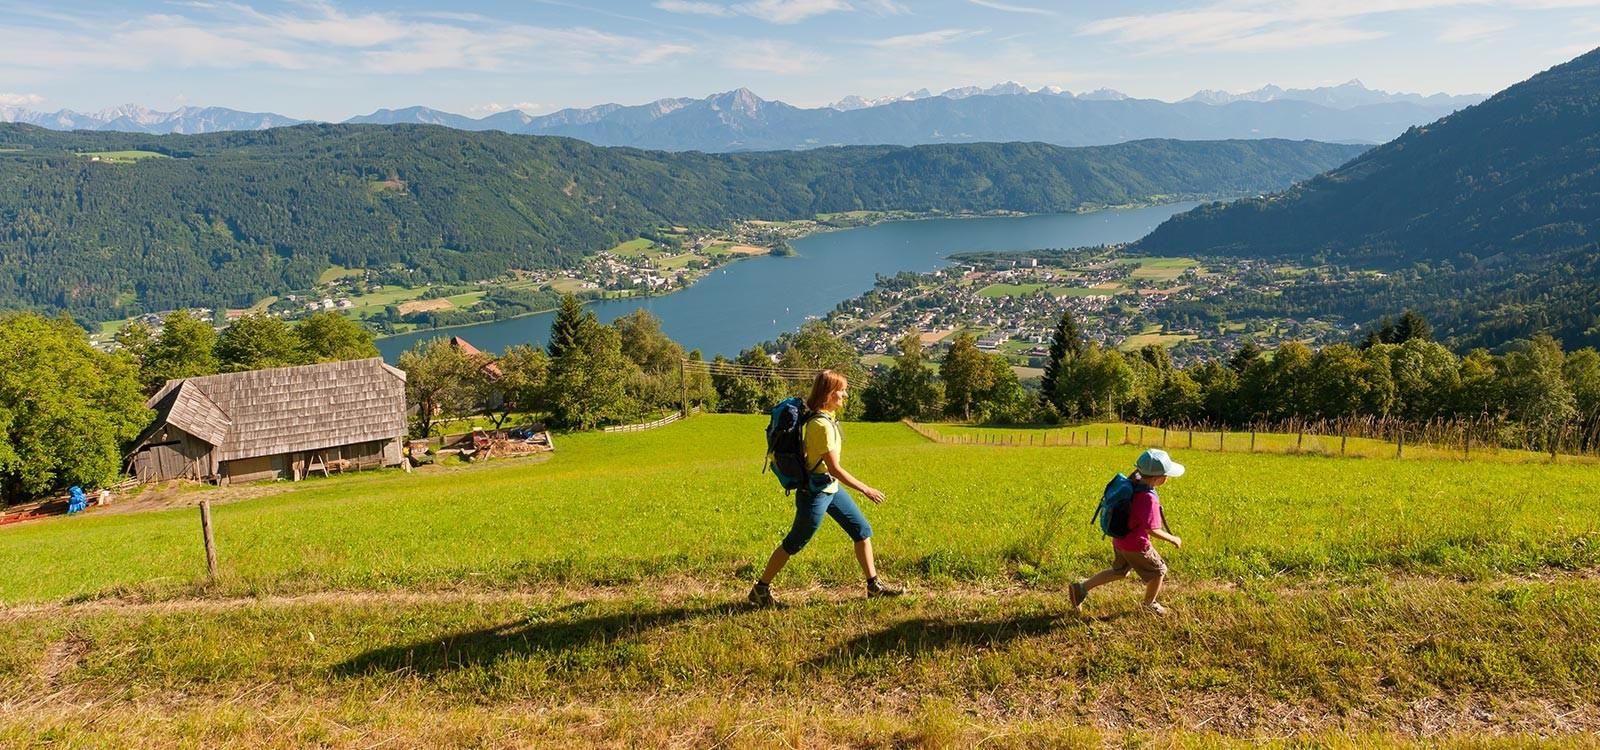 Wandern am Ossiacher-See